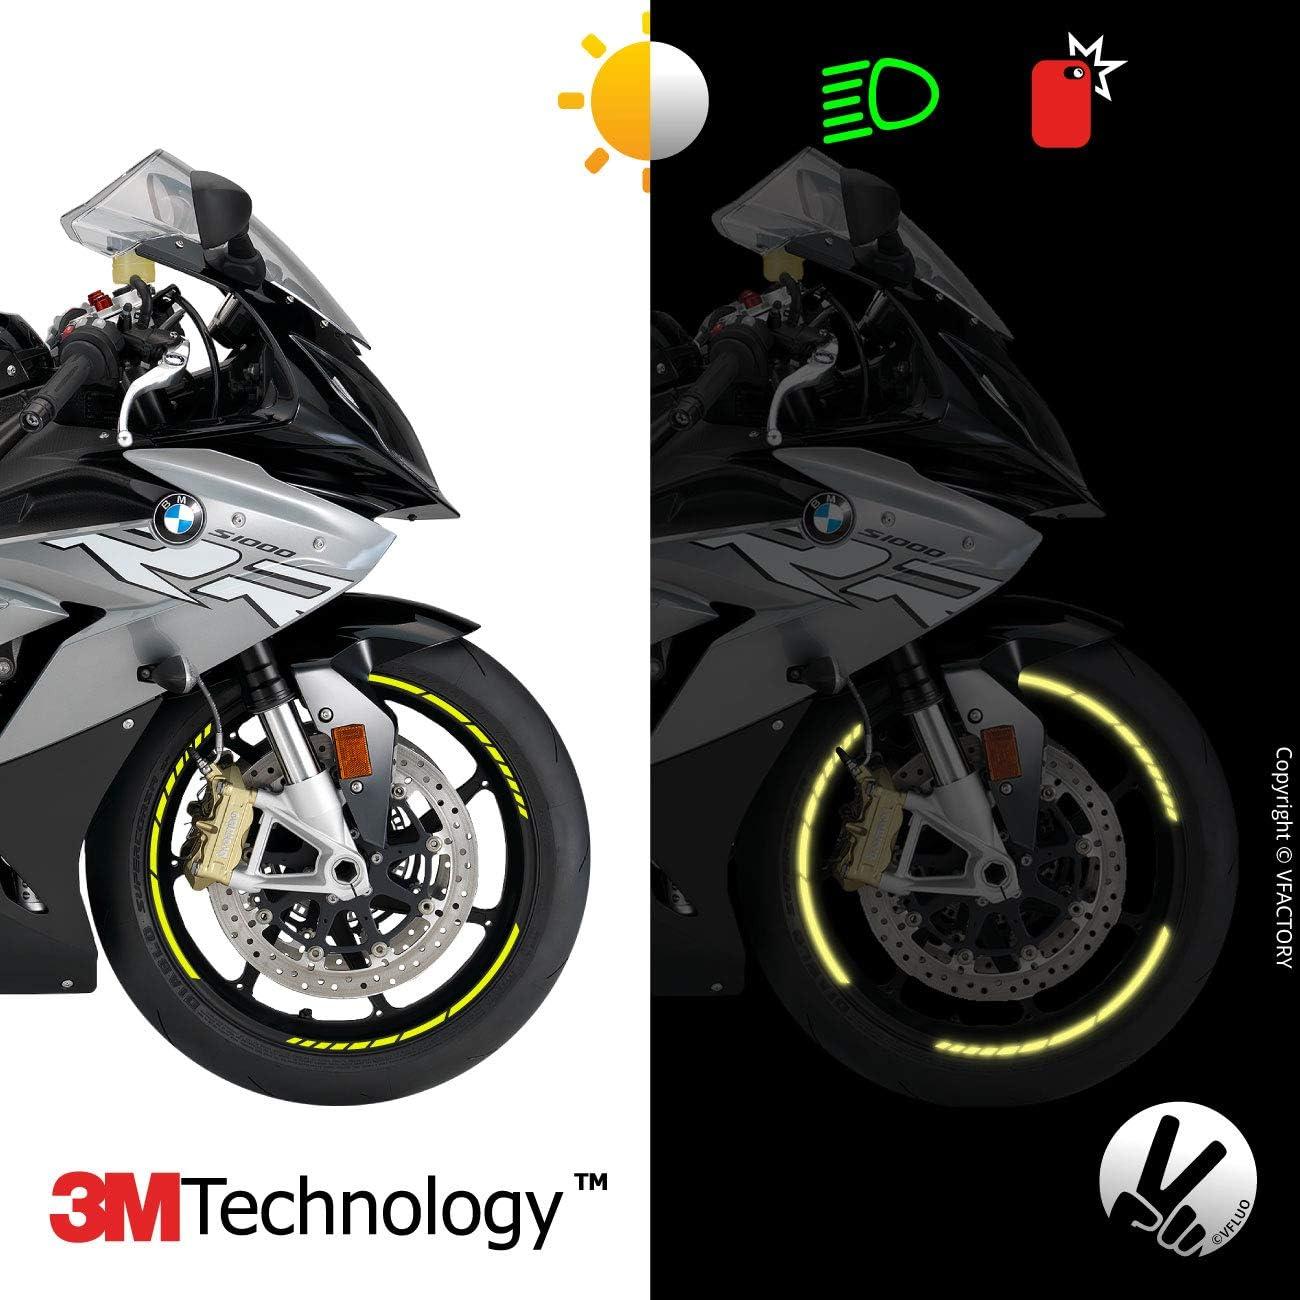 7mm breit Schwarz Motorrad Retro reflektierende Felgenrandaufkleber Kit 3M Technology/™ 1 Felge VFLUO GP Design/™